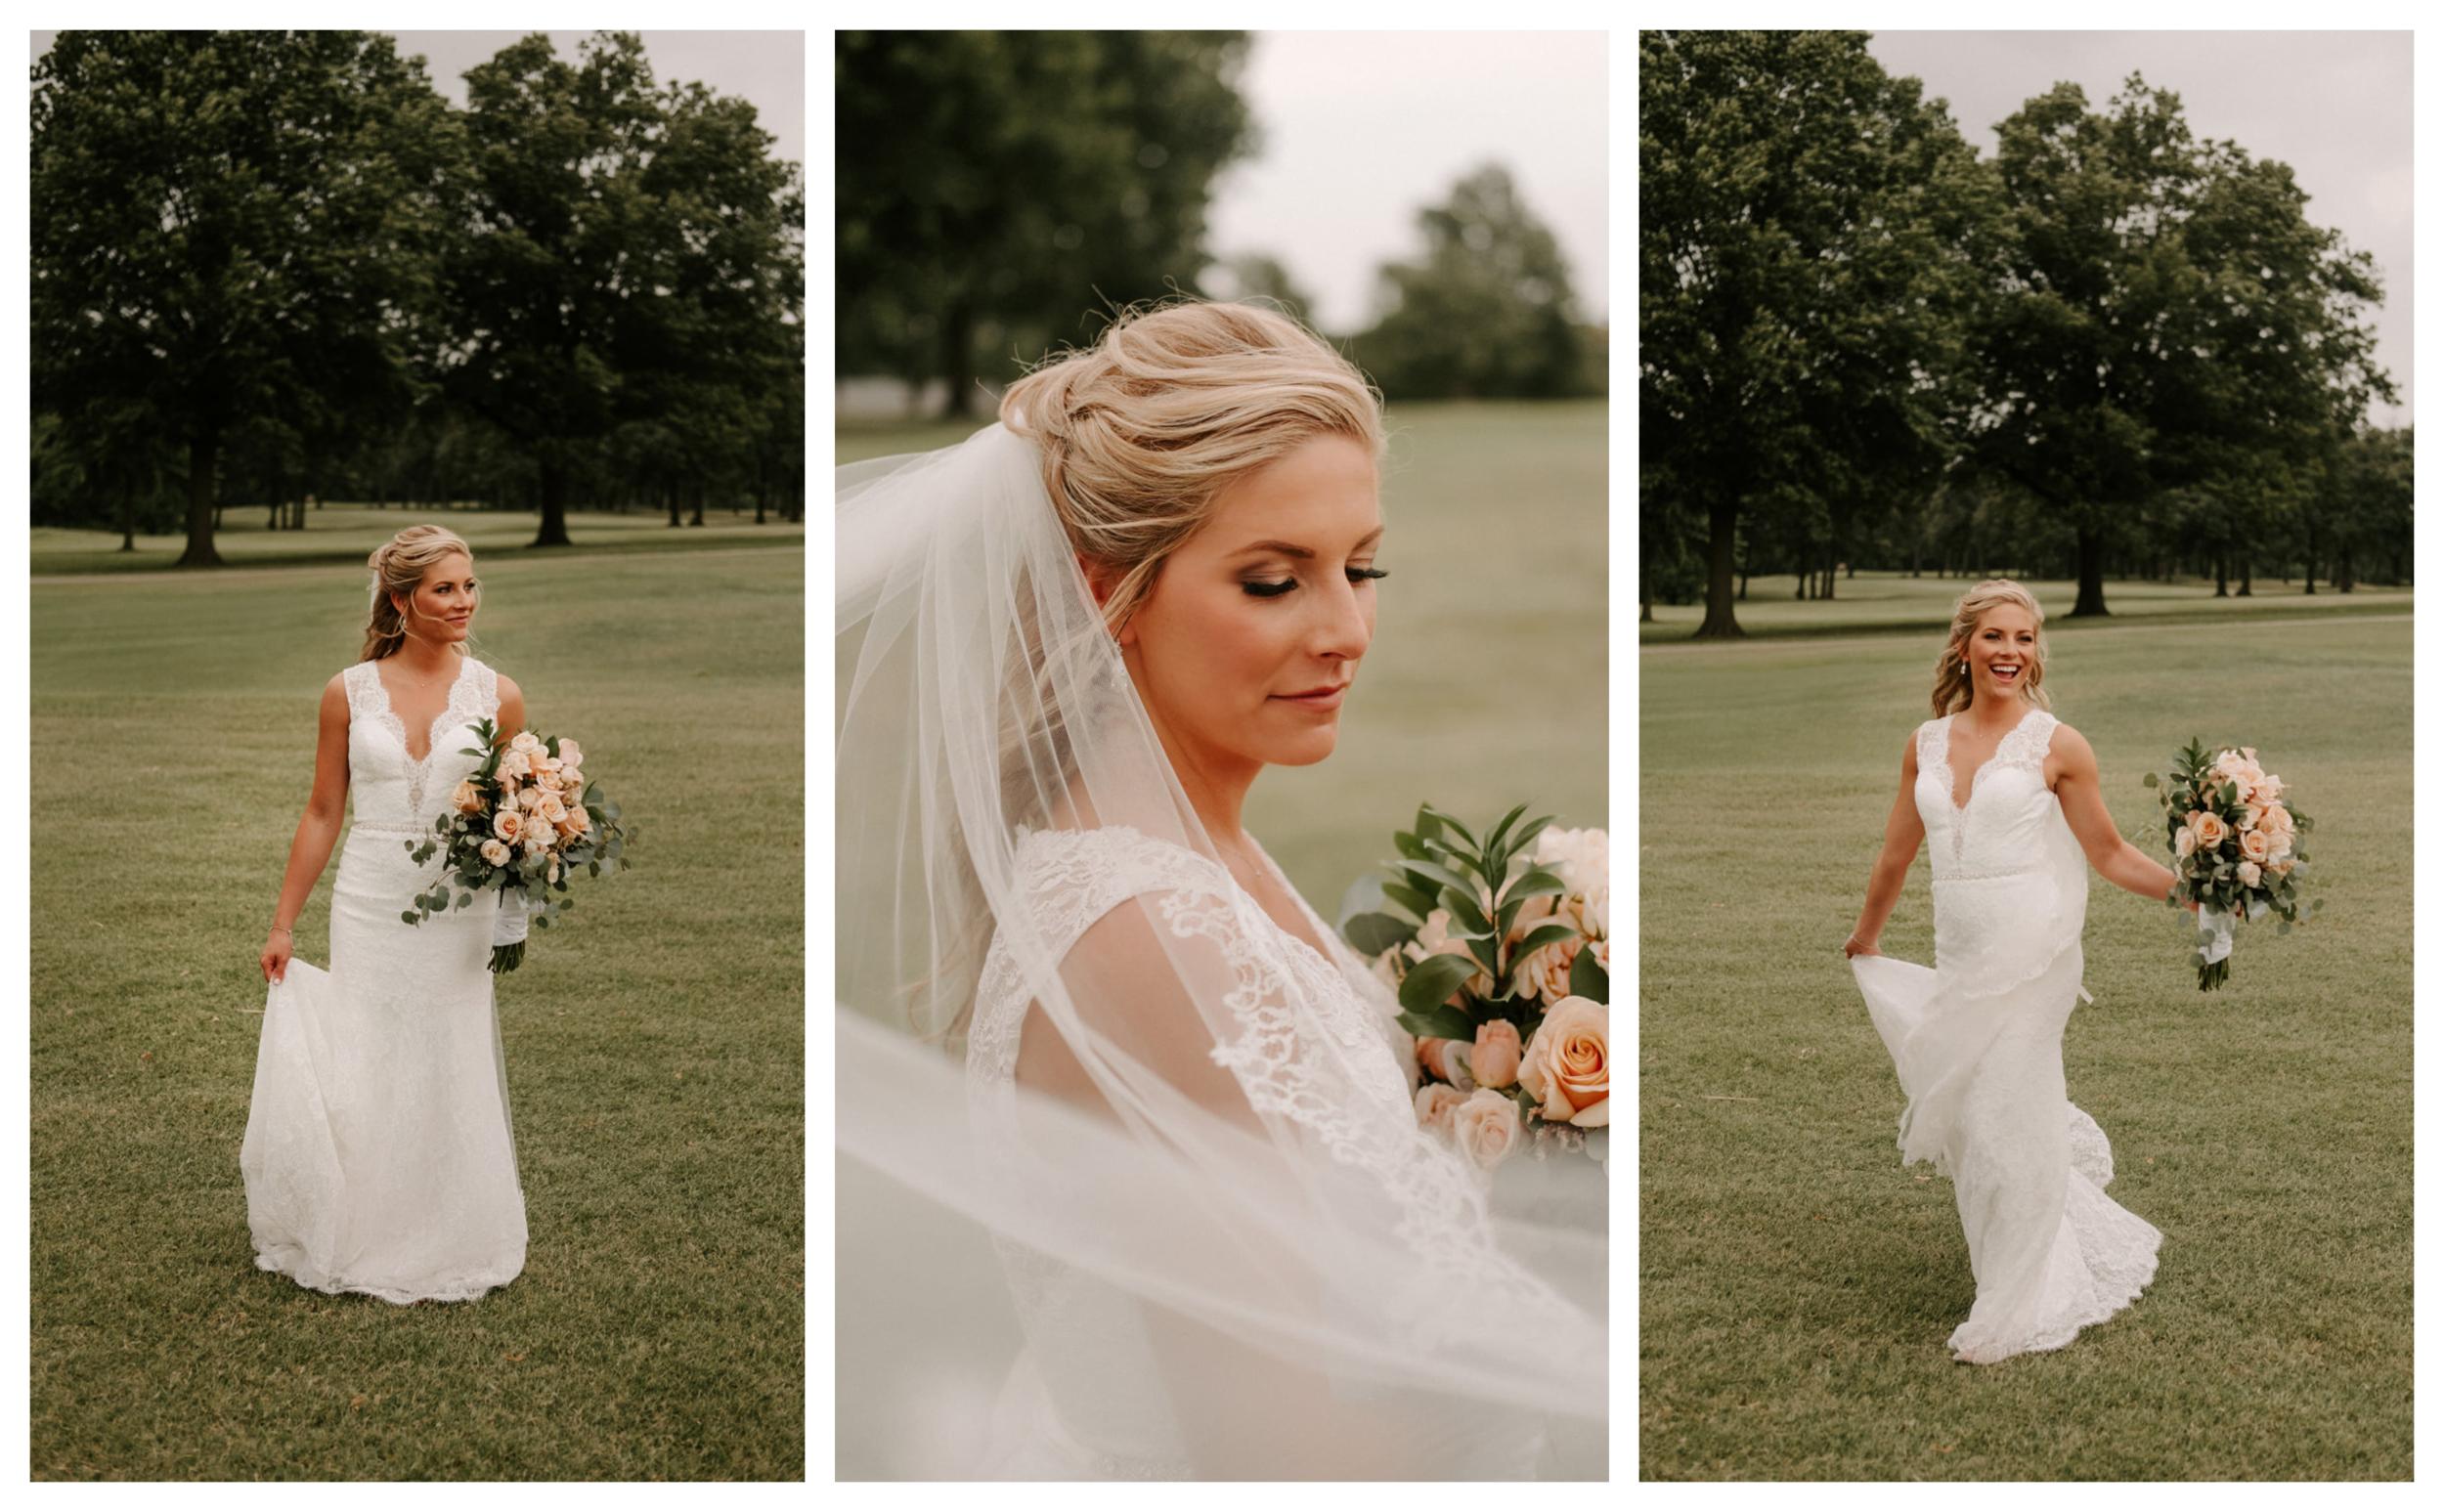 Webster Wedding Blog - Kansas City Bride26